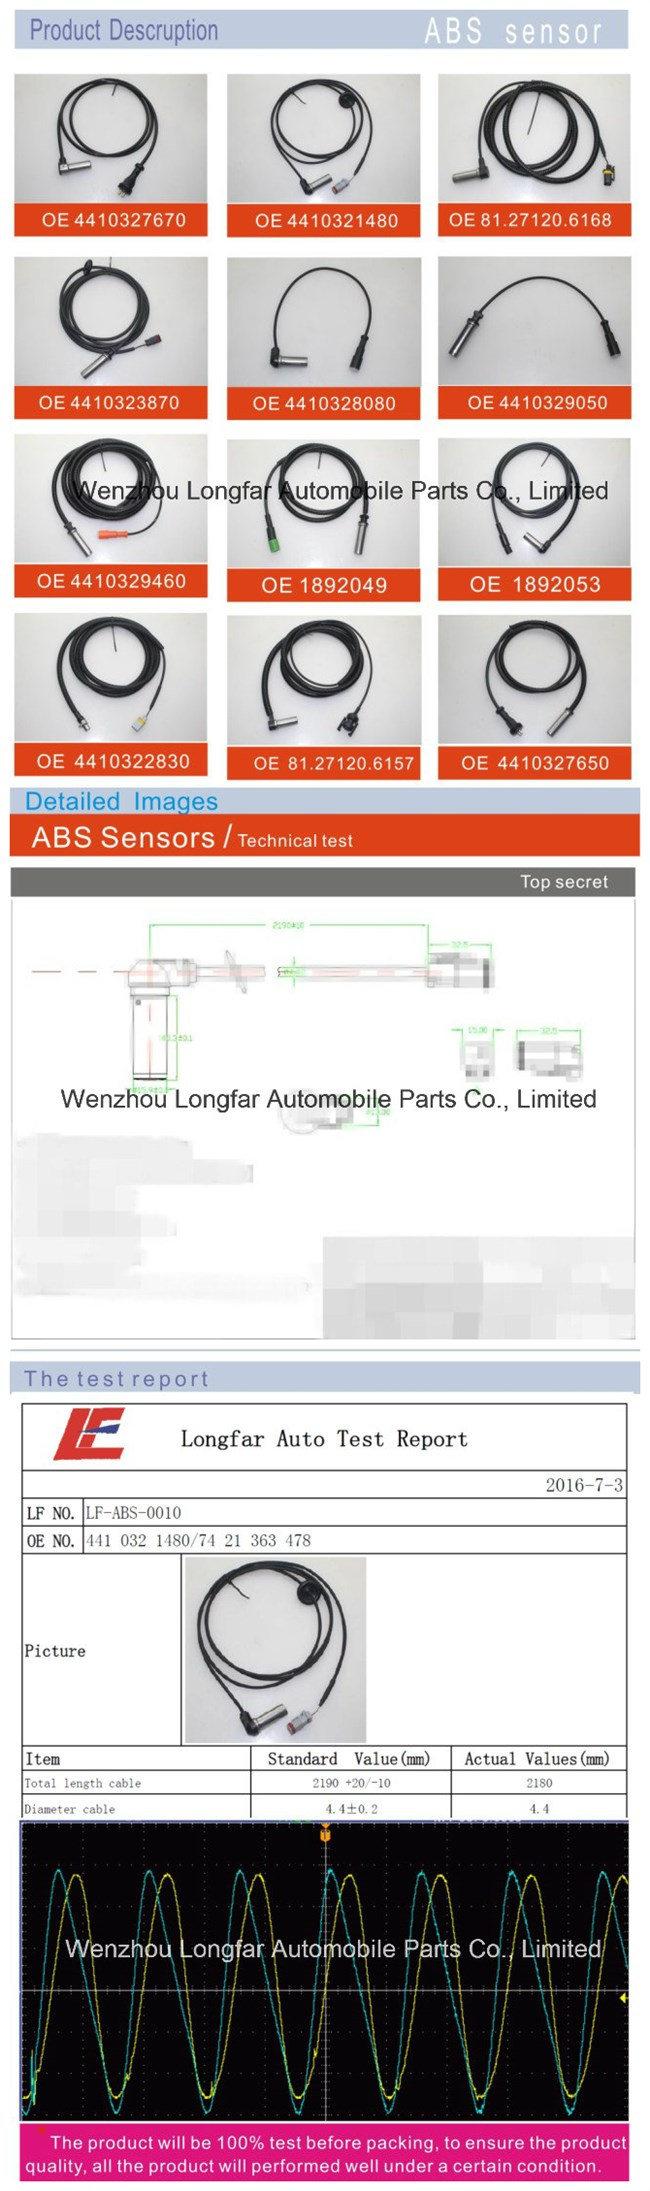 Auto Truck ABS Sensor Anti-Lock Braking System Transducer Indicator Sensor 12-34 899 0011, 81271206169, 81.27120.6125, 096.391, 75745, 3.37145 for Man,Dt,Meyle